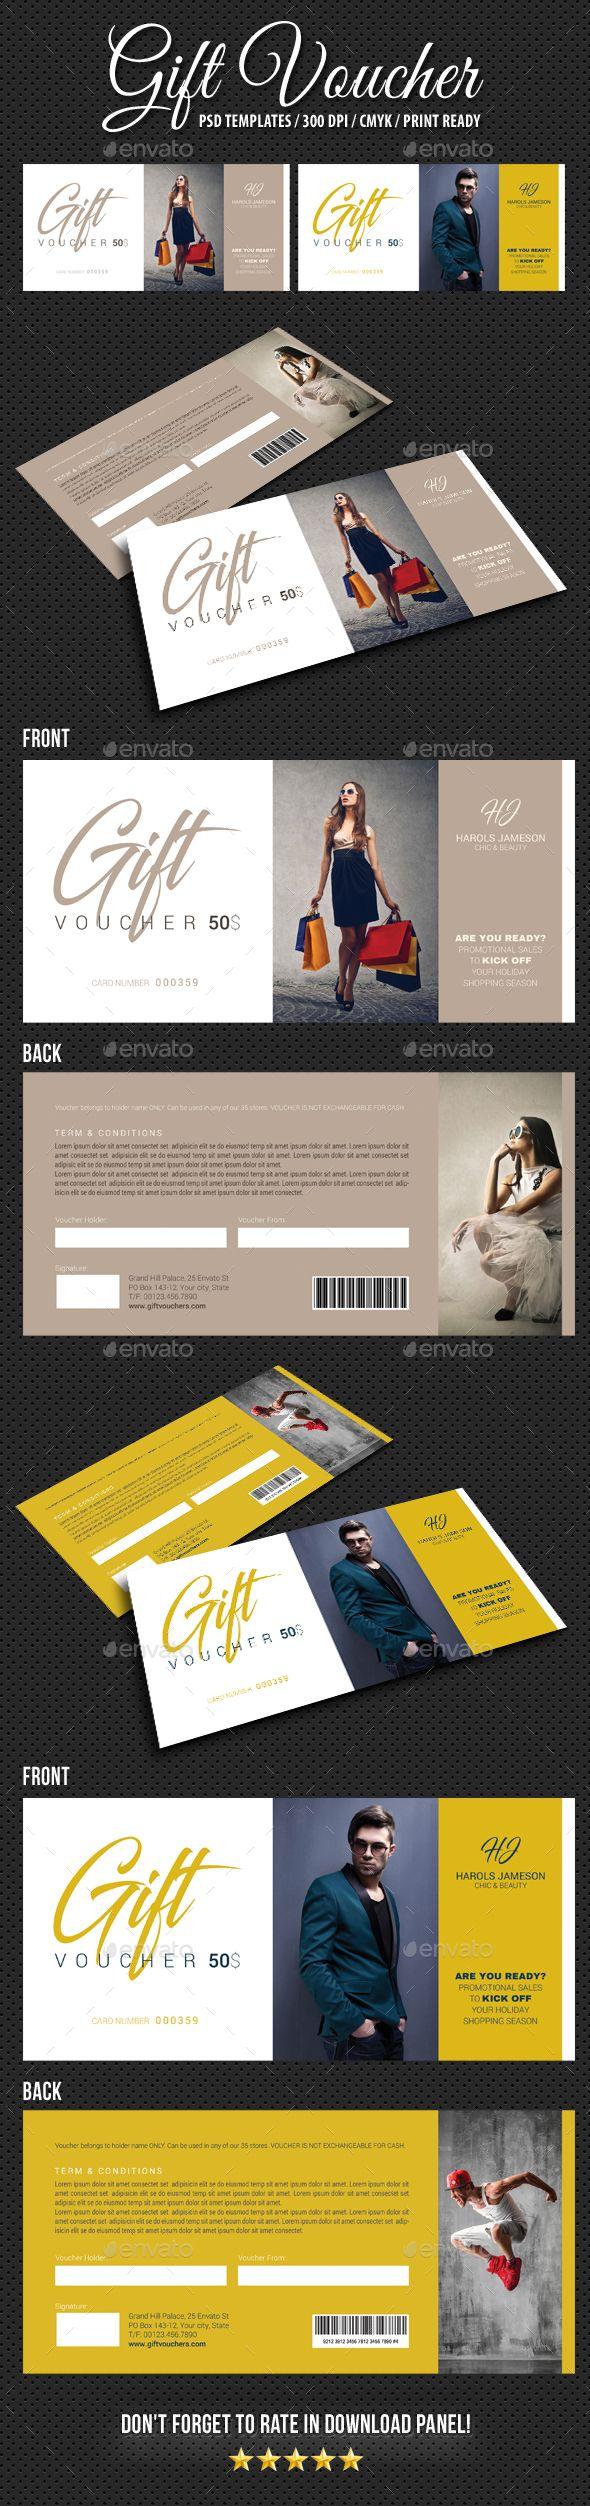 Gift Voucher V12 - Cards & Invites Print Templates